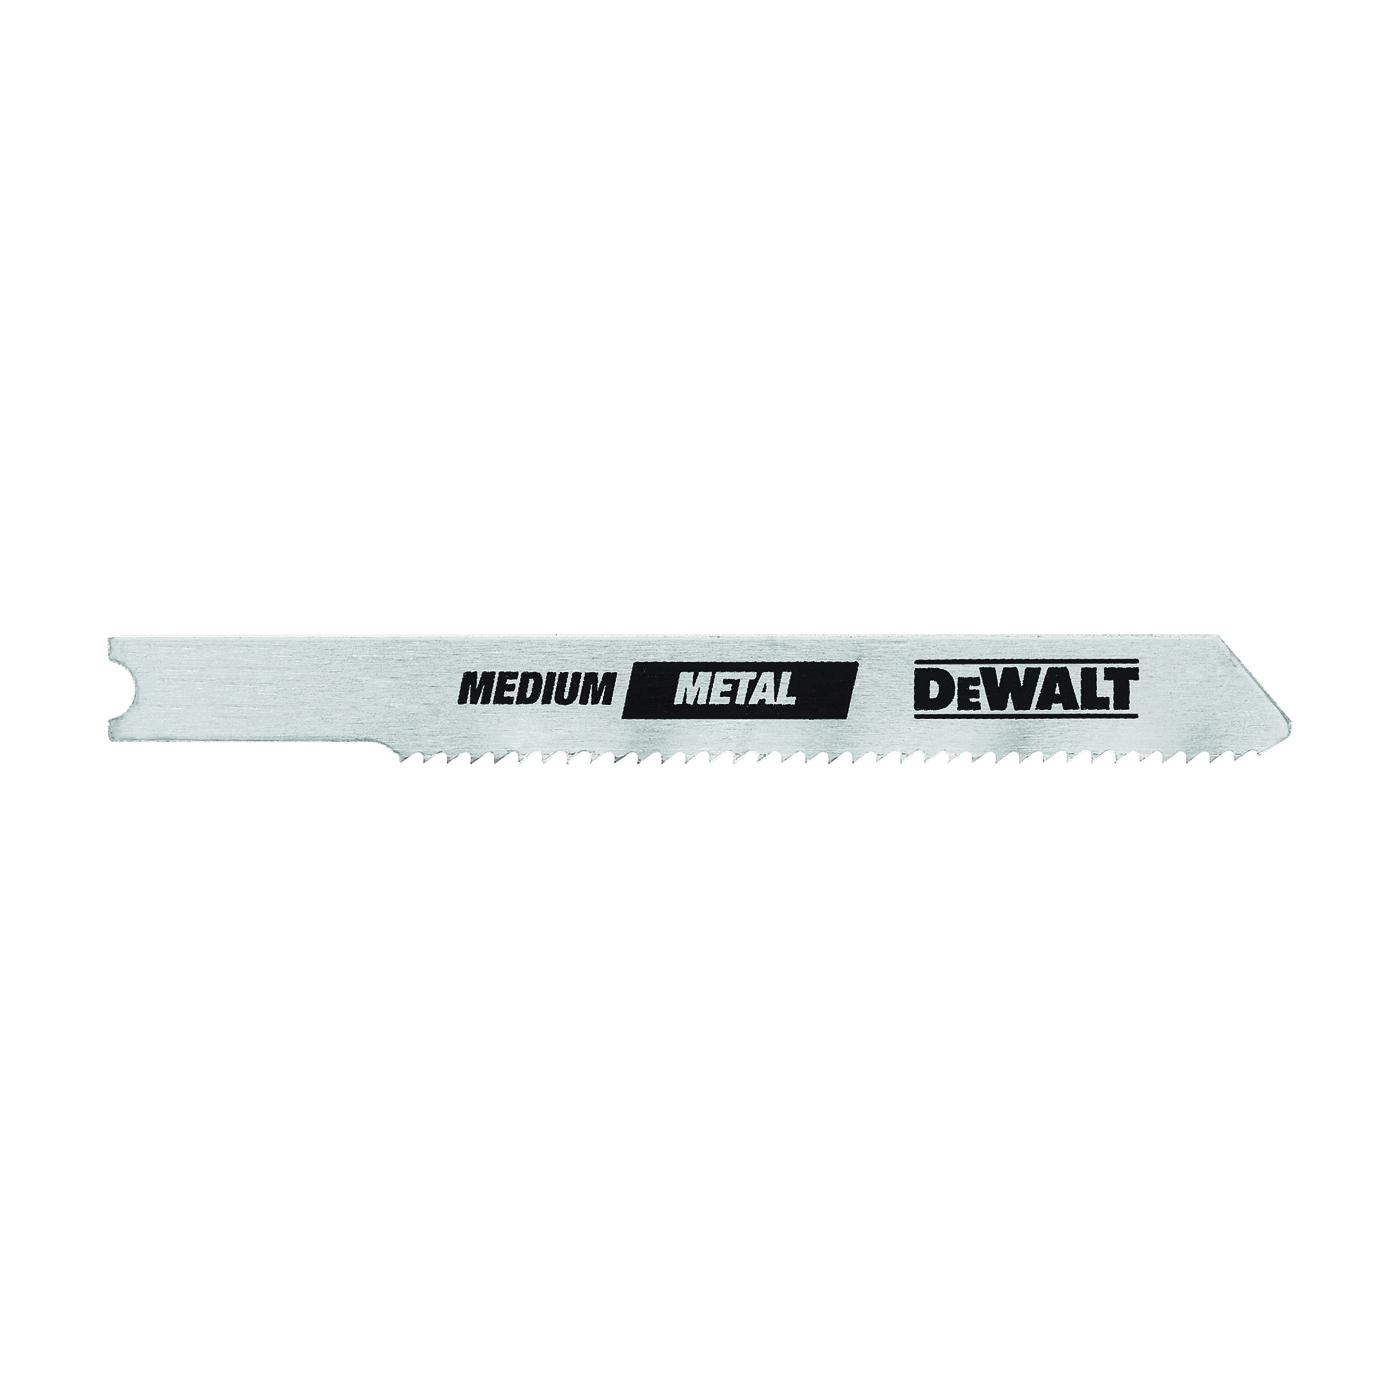 Picture of DeWALT DW3755H Jig Saw Blade, 1/4 in W, 8 TPI